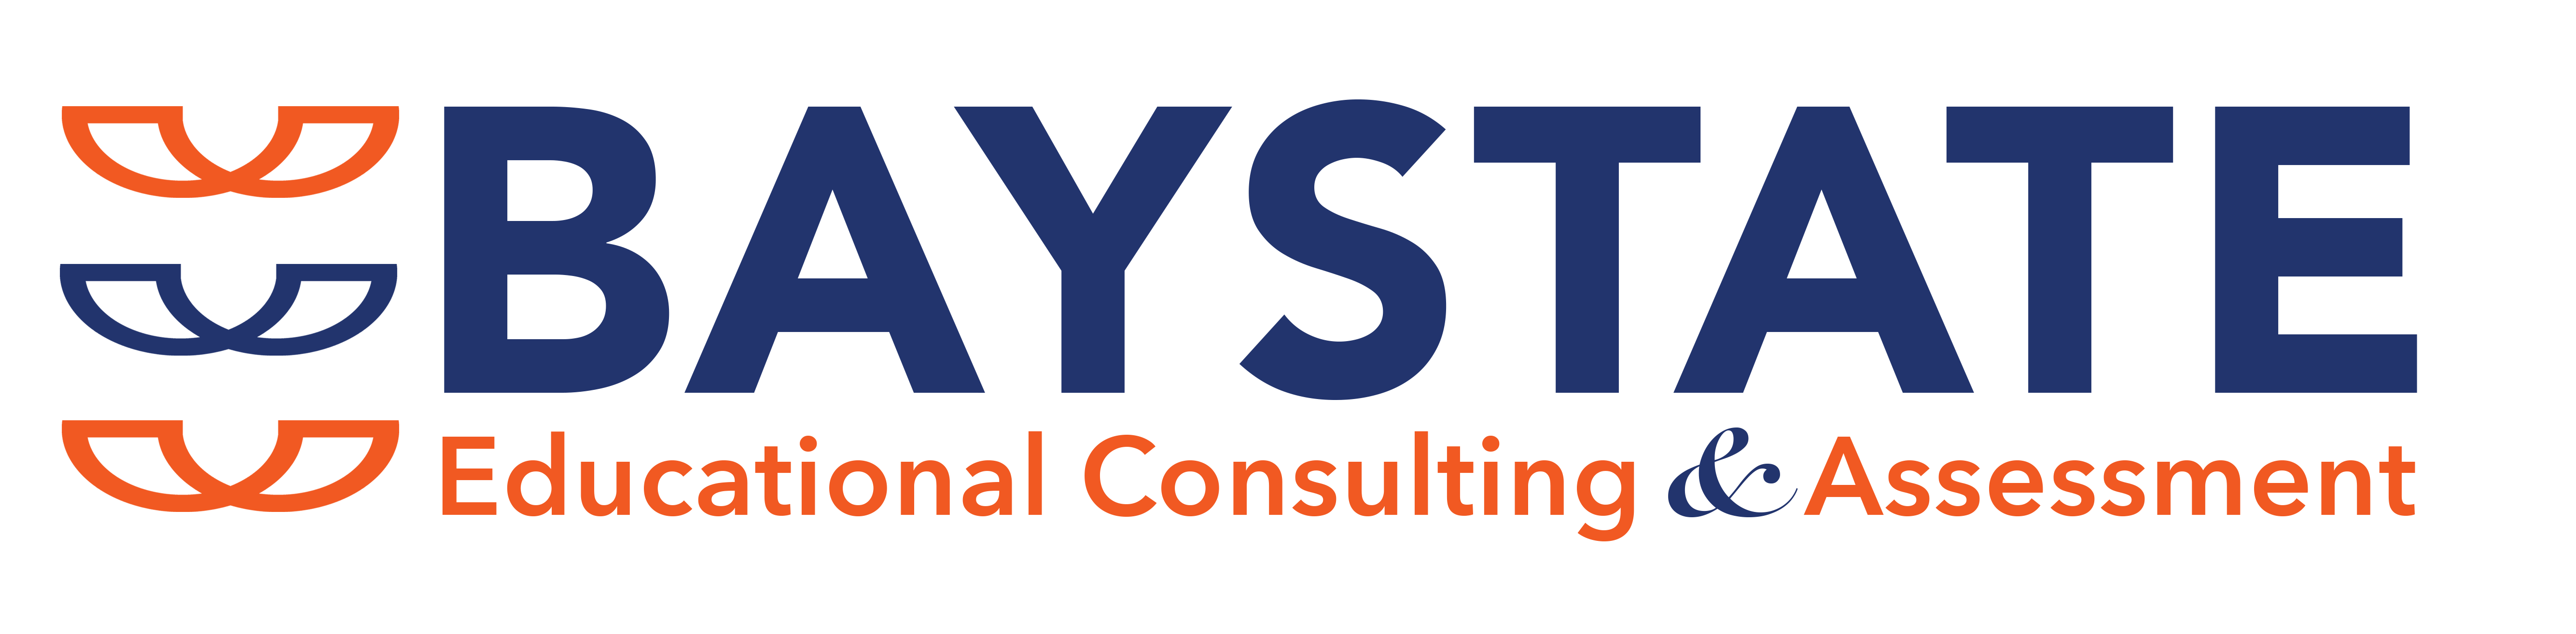 BayStateEducation - Mets.png